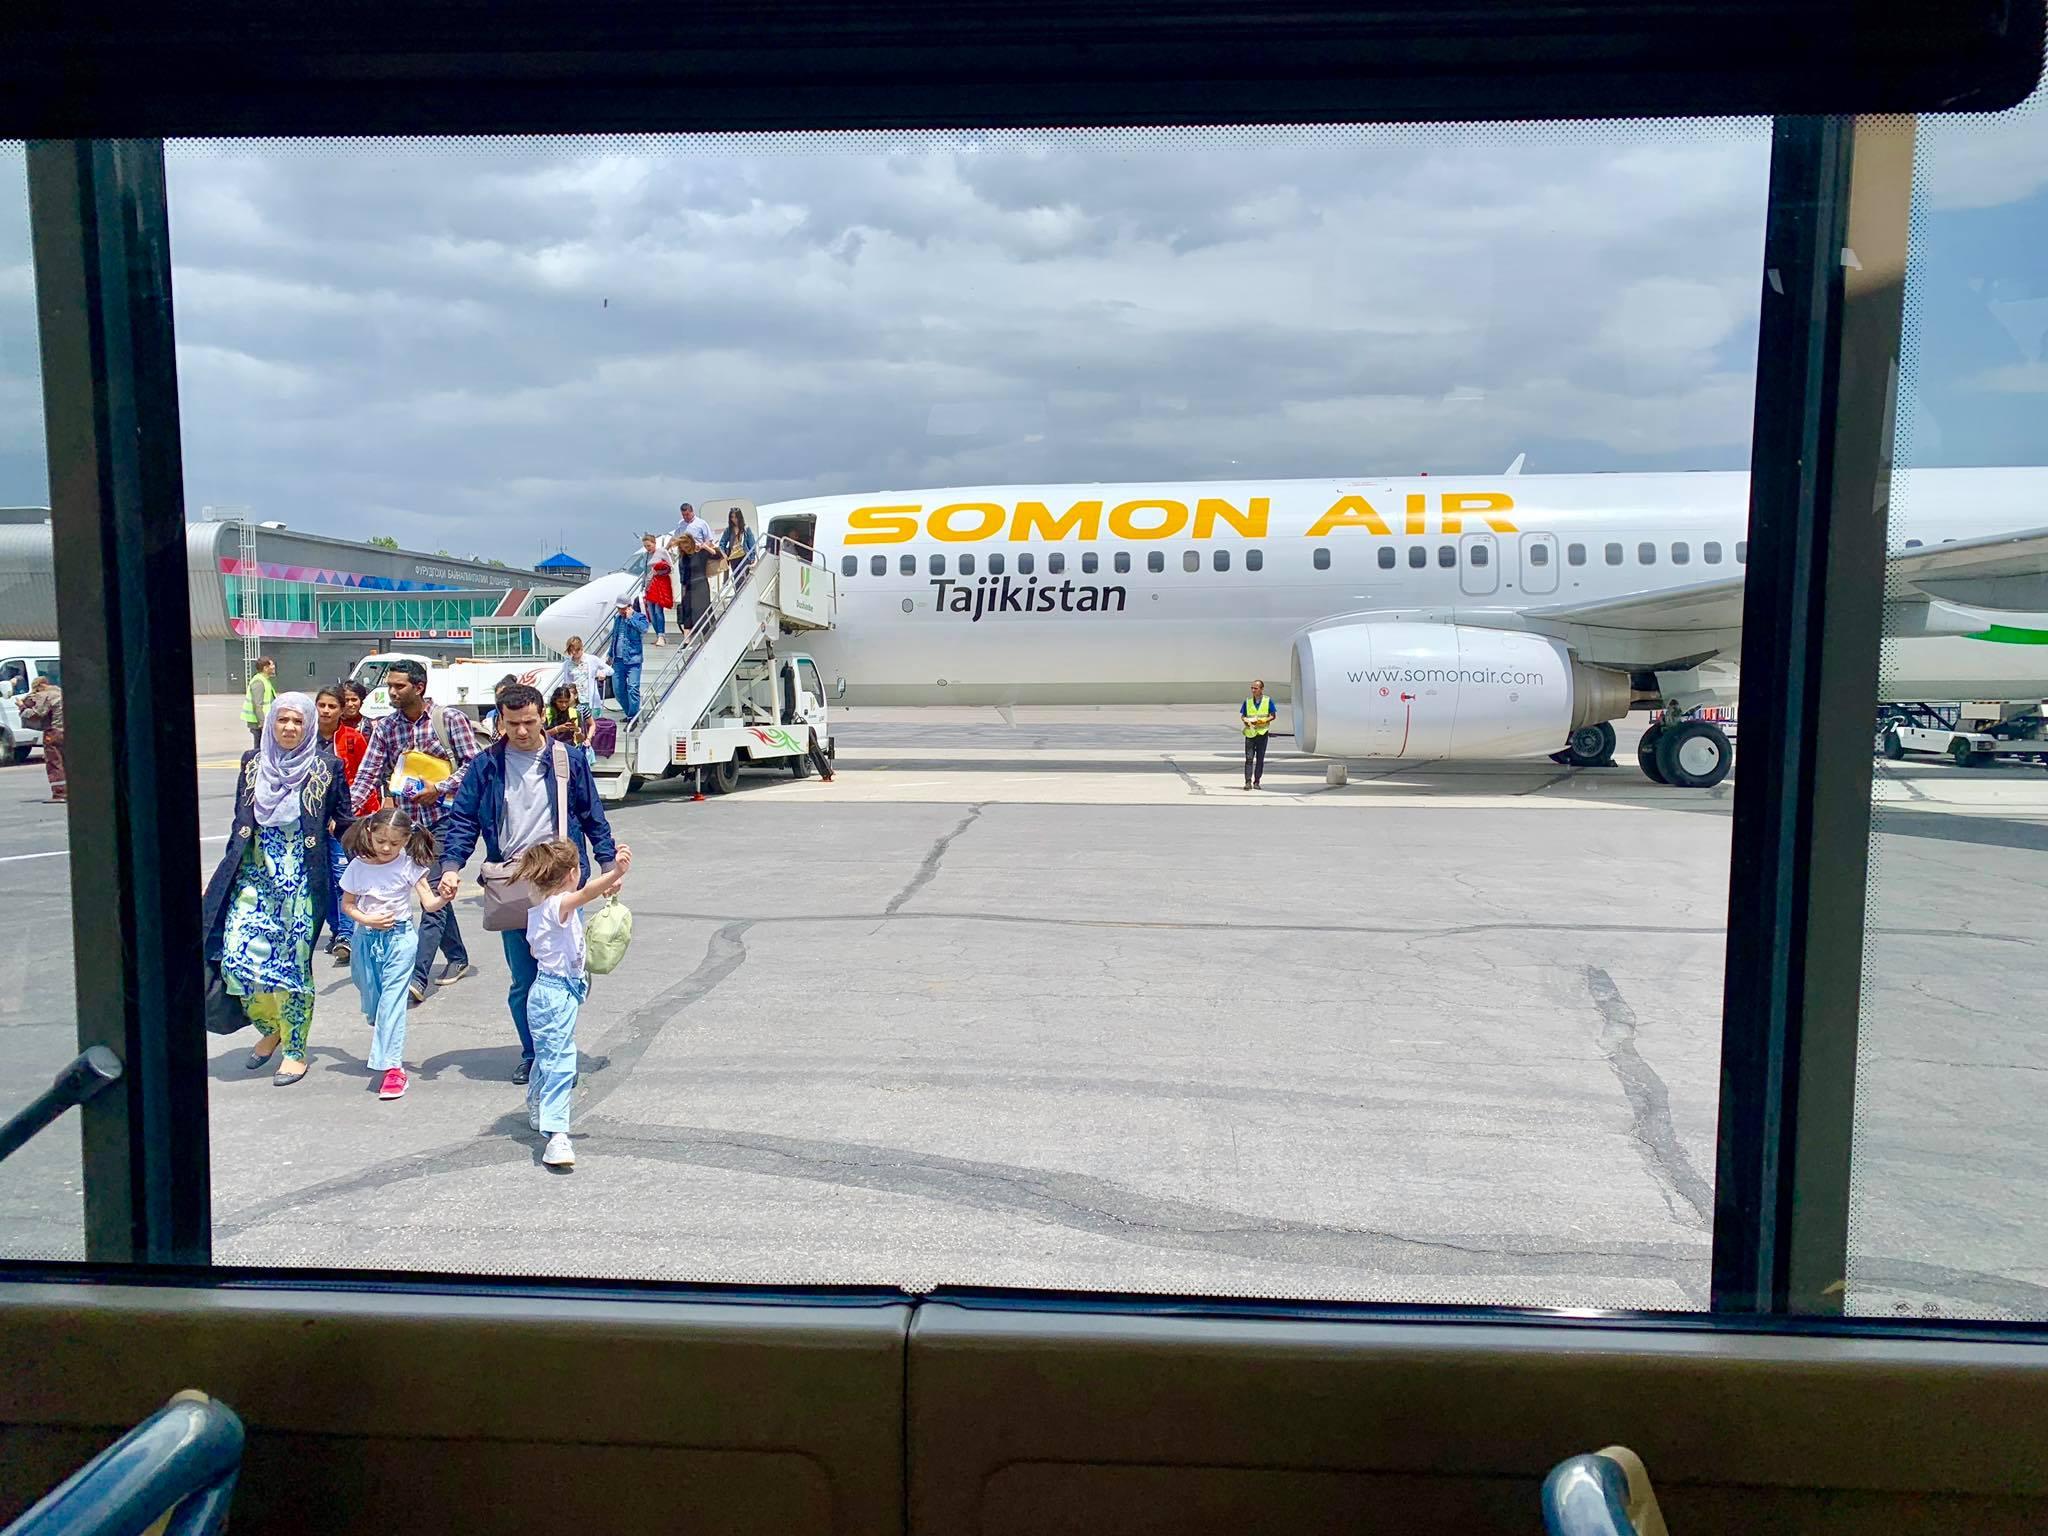 Kach Solo Travels in 2019 I just arrived in Dushanbe, Tajikistan.jpg